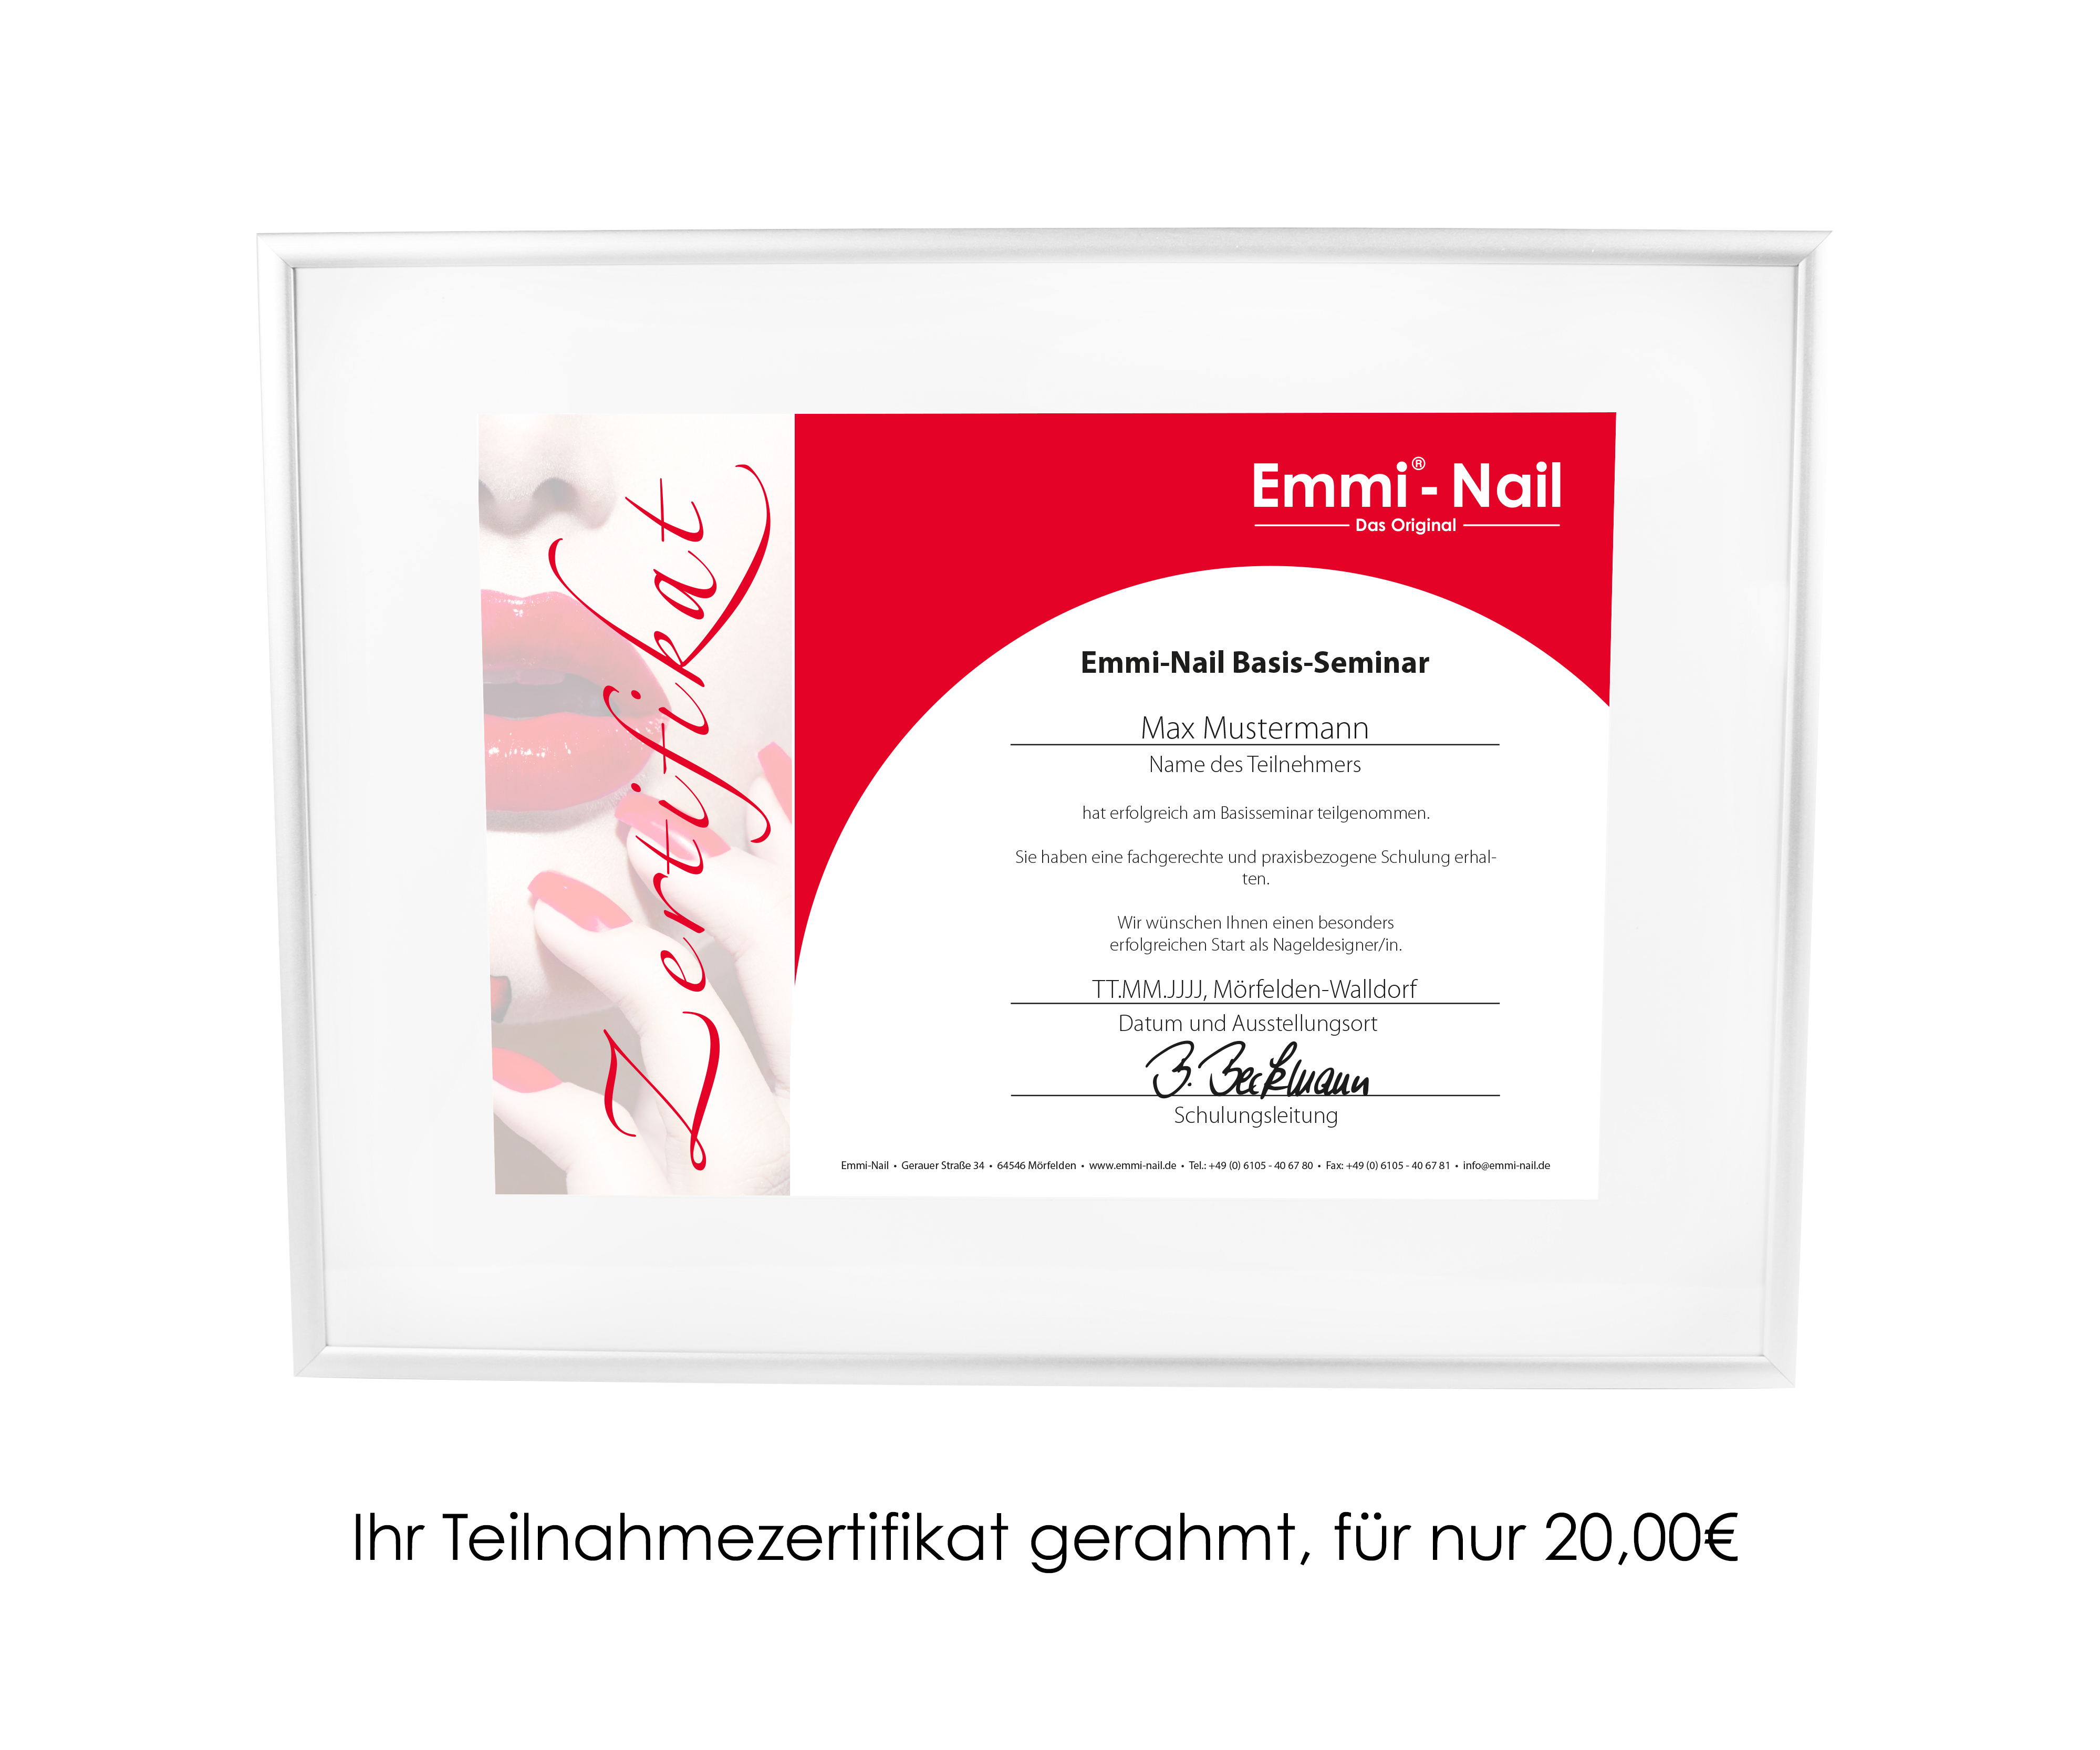 Zertifikat Basis-Seminar